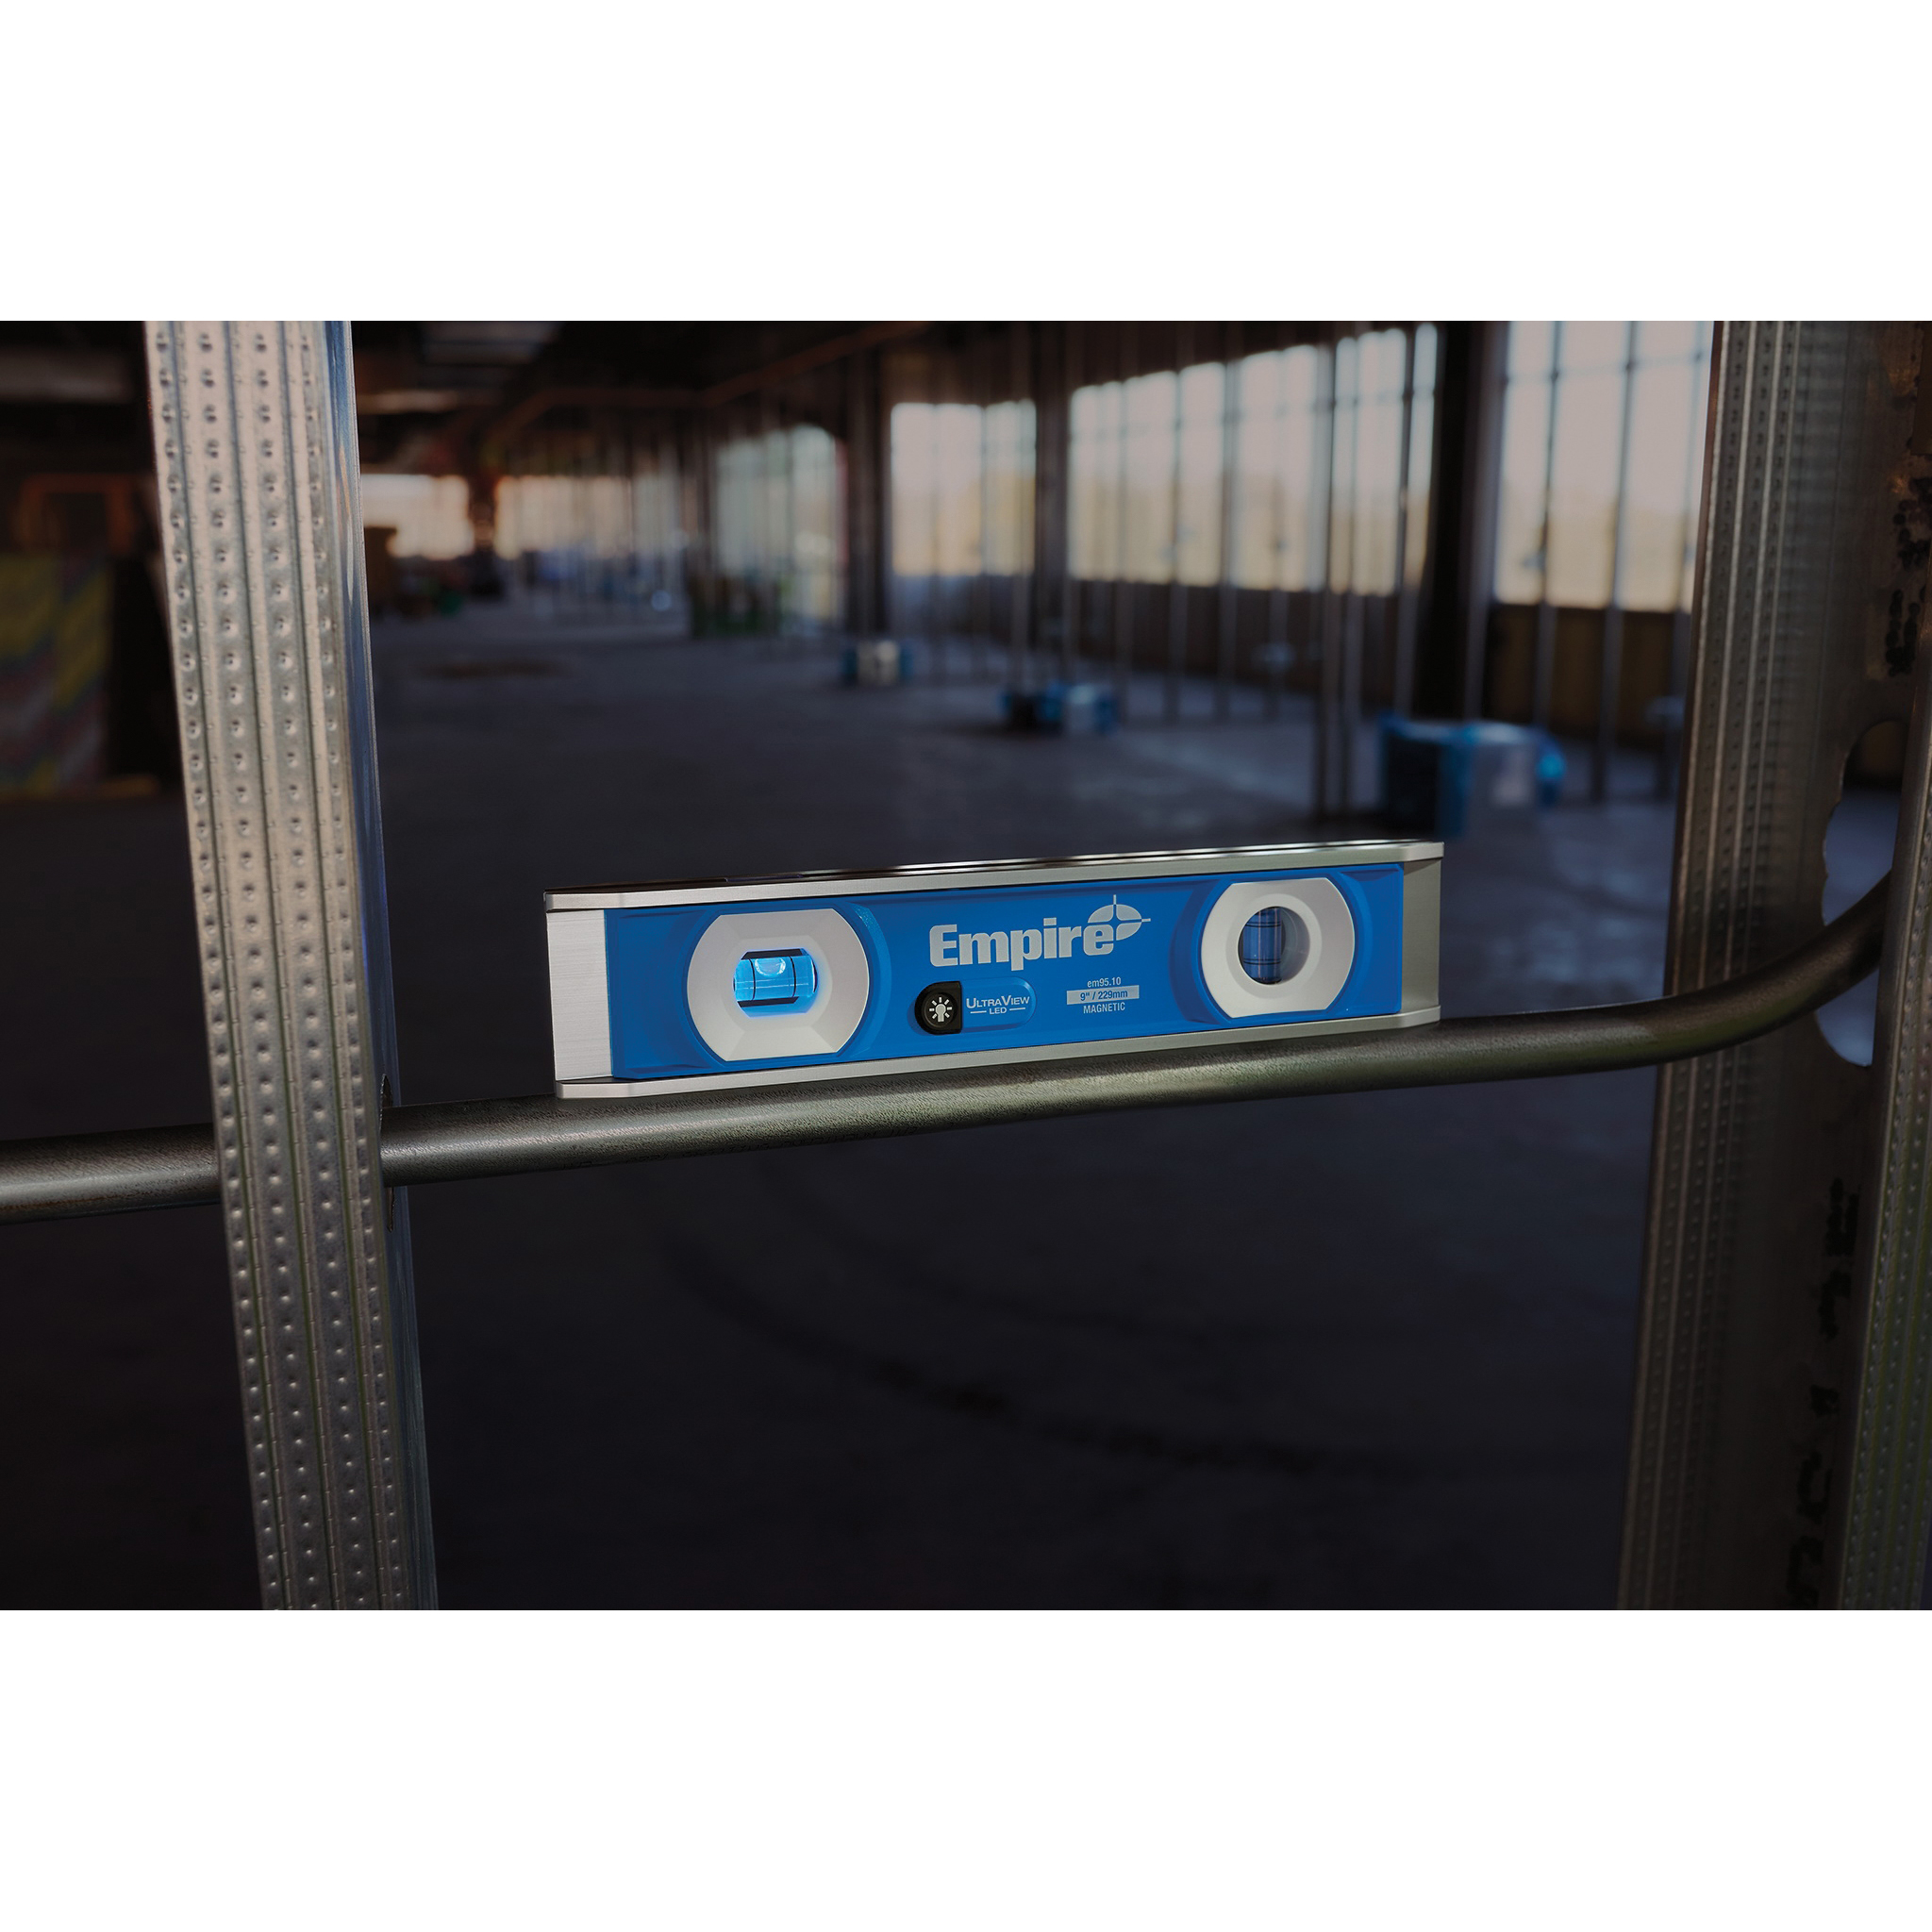 Picture of Empire True Blue e95 UltraView EM95.10 LED Magnetic Torpedo Level, 9 in L, 2 -Vial, Magnetic, Aluminum, Blue